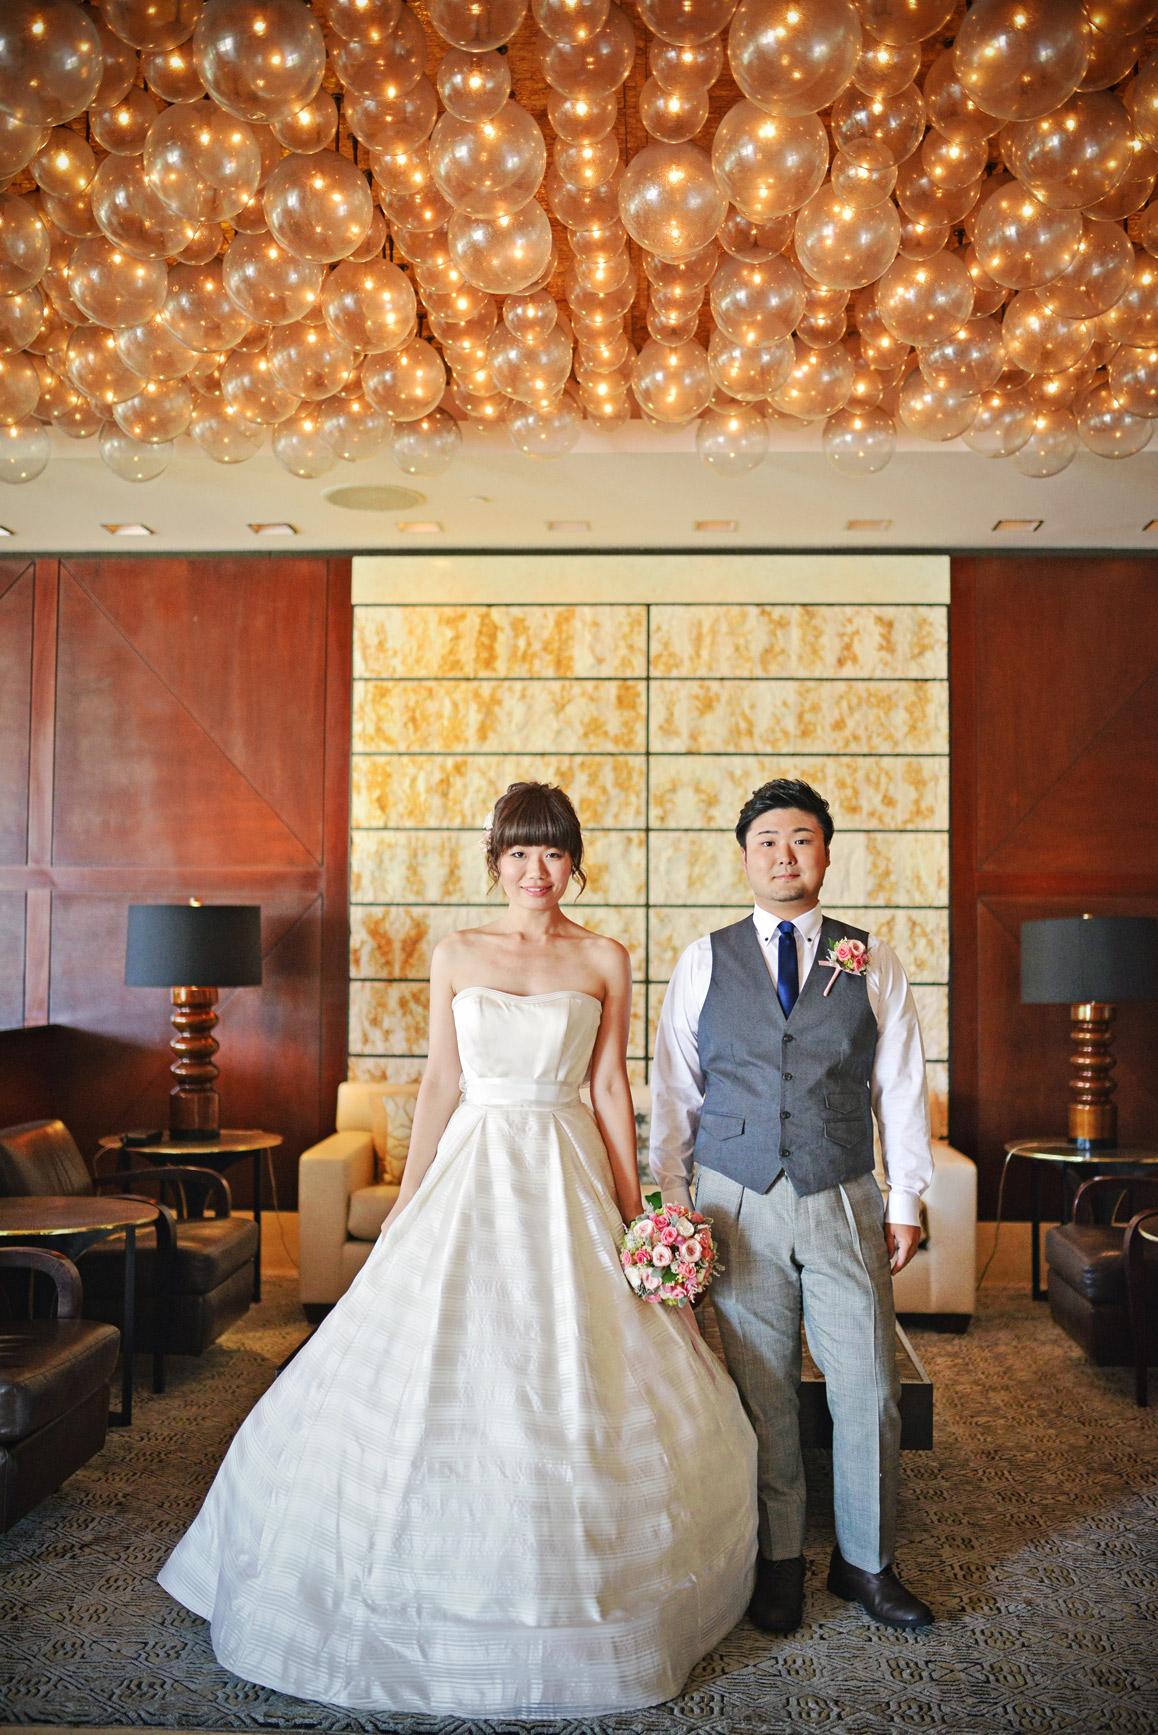 waikiki-beach-wedding-and-downtown-honolulu-hawaii-theater-stephen-ludwig-photography063.jpg